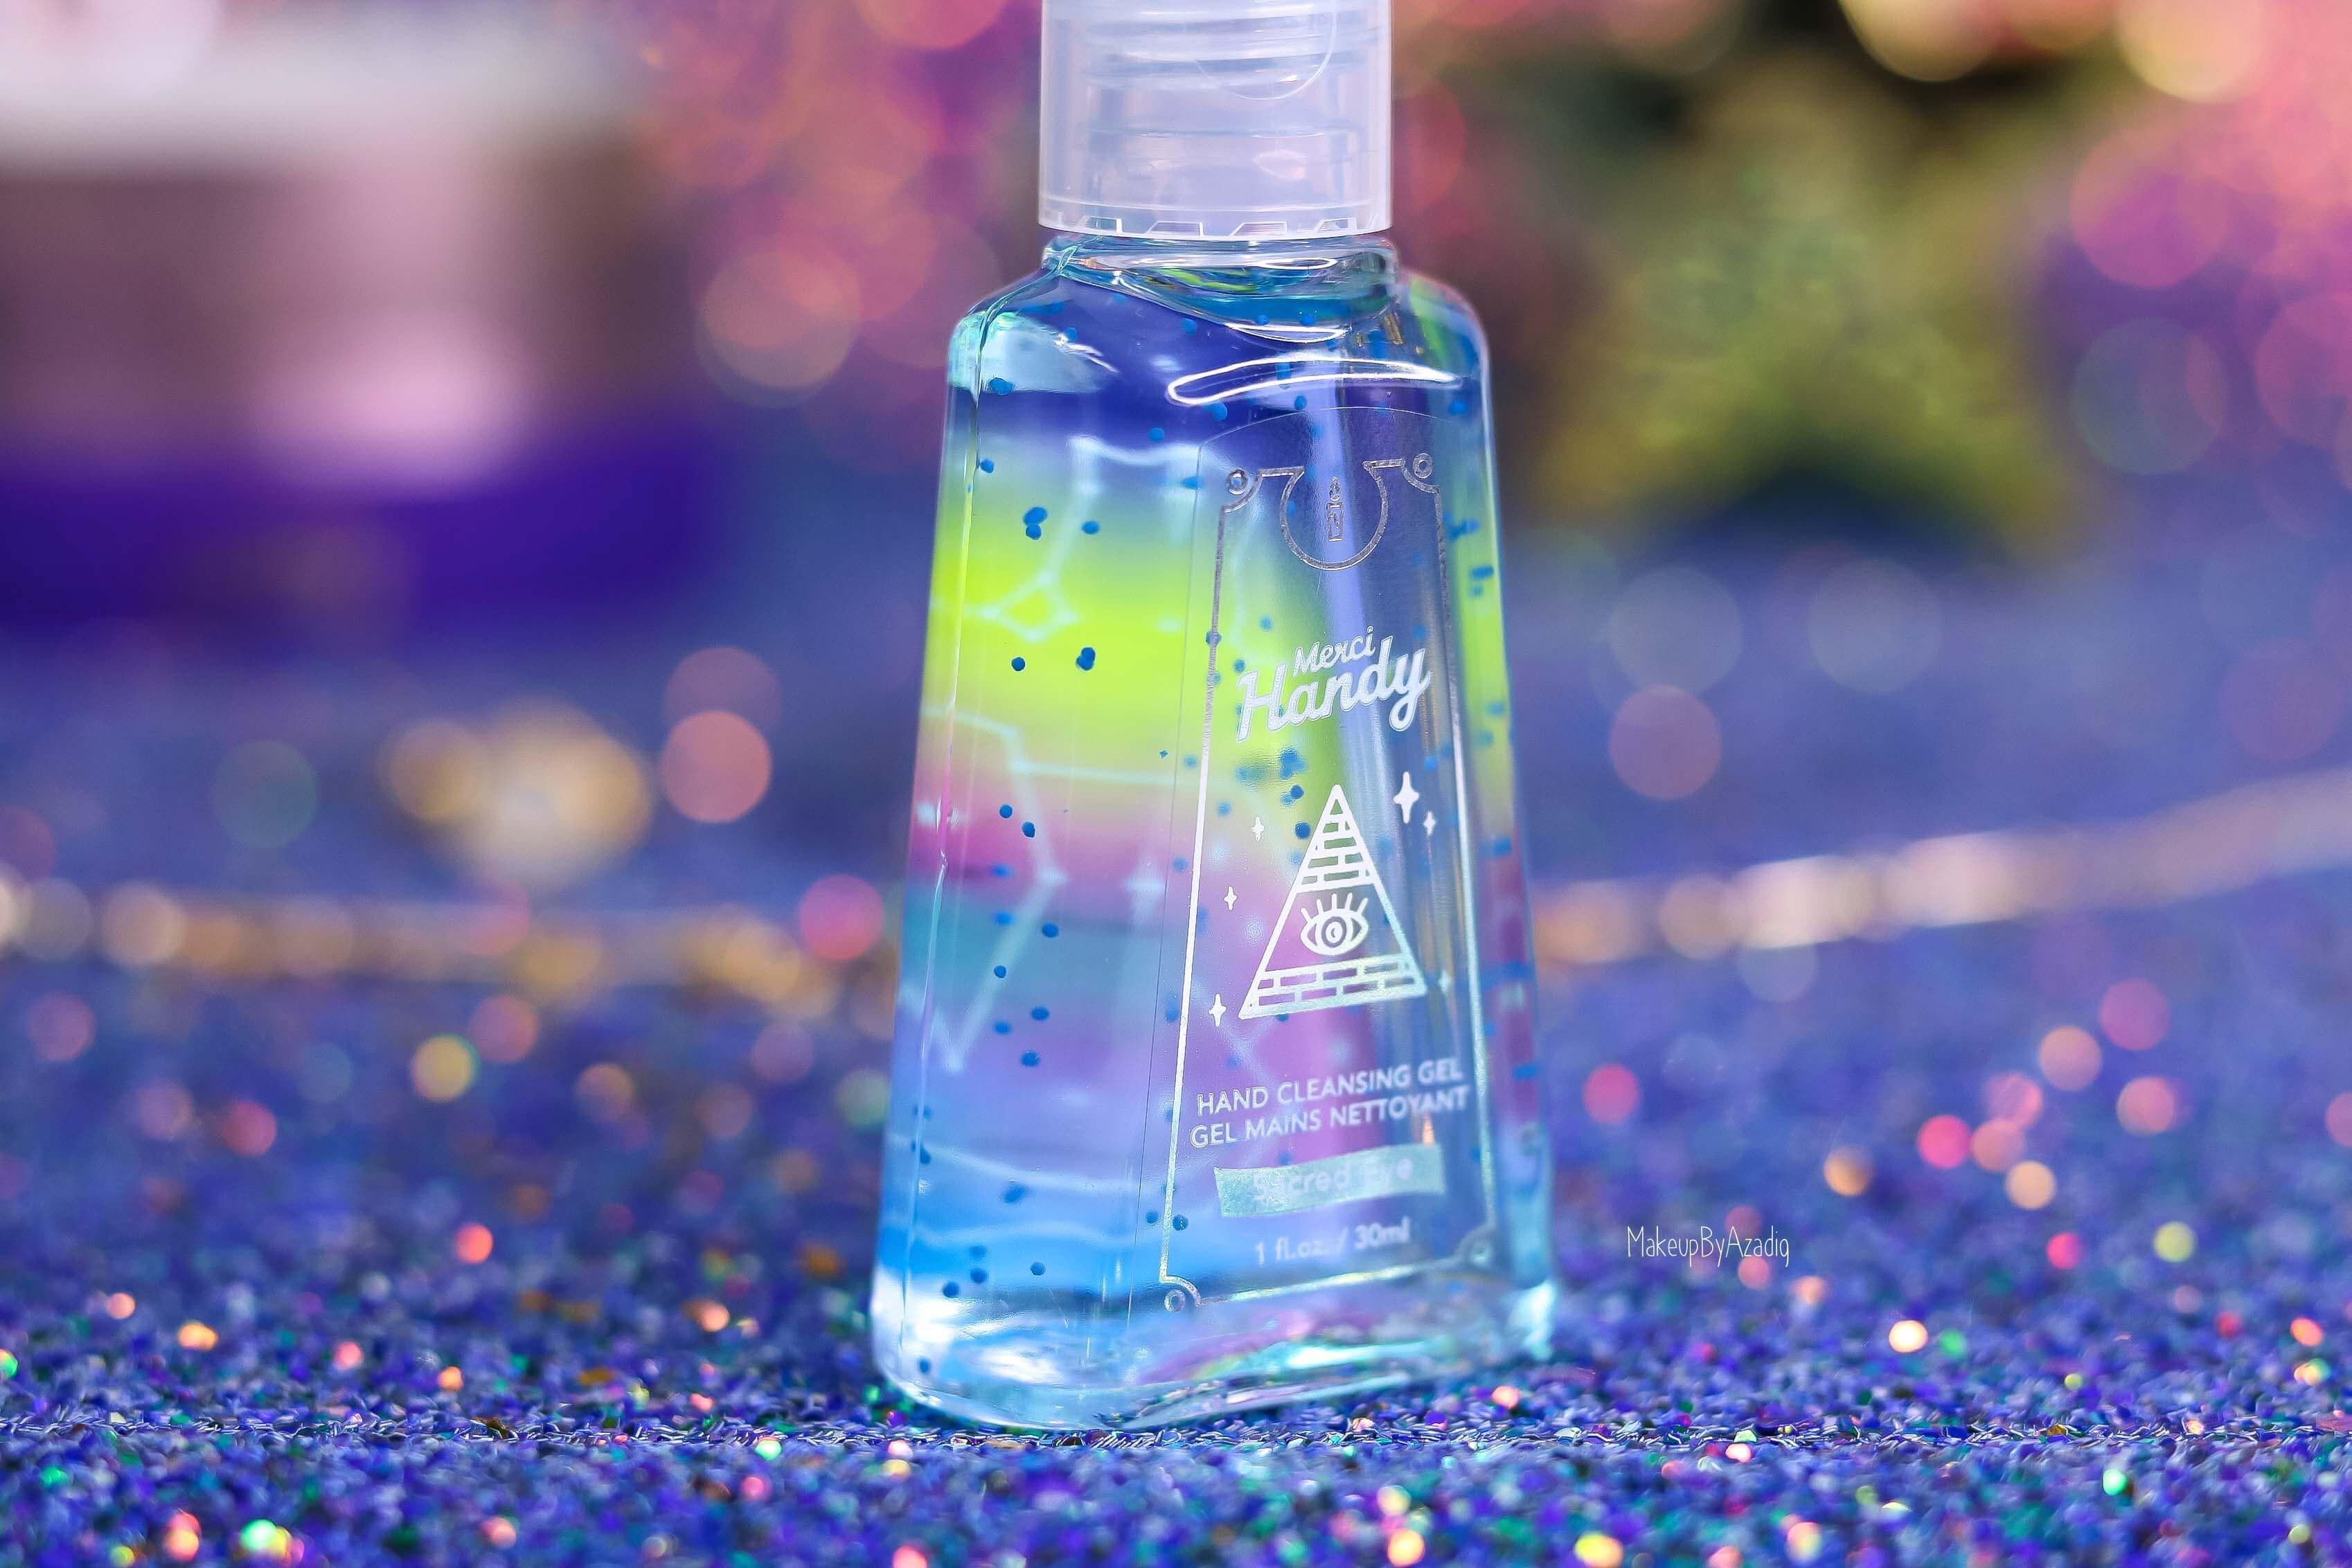 revue-coffret-collection-gel-antibacteriens-merci-handy-crystal-ball-mystique-makeupbyazadig-new-avis-prix-senteur-sephora-france-couleur